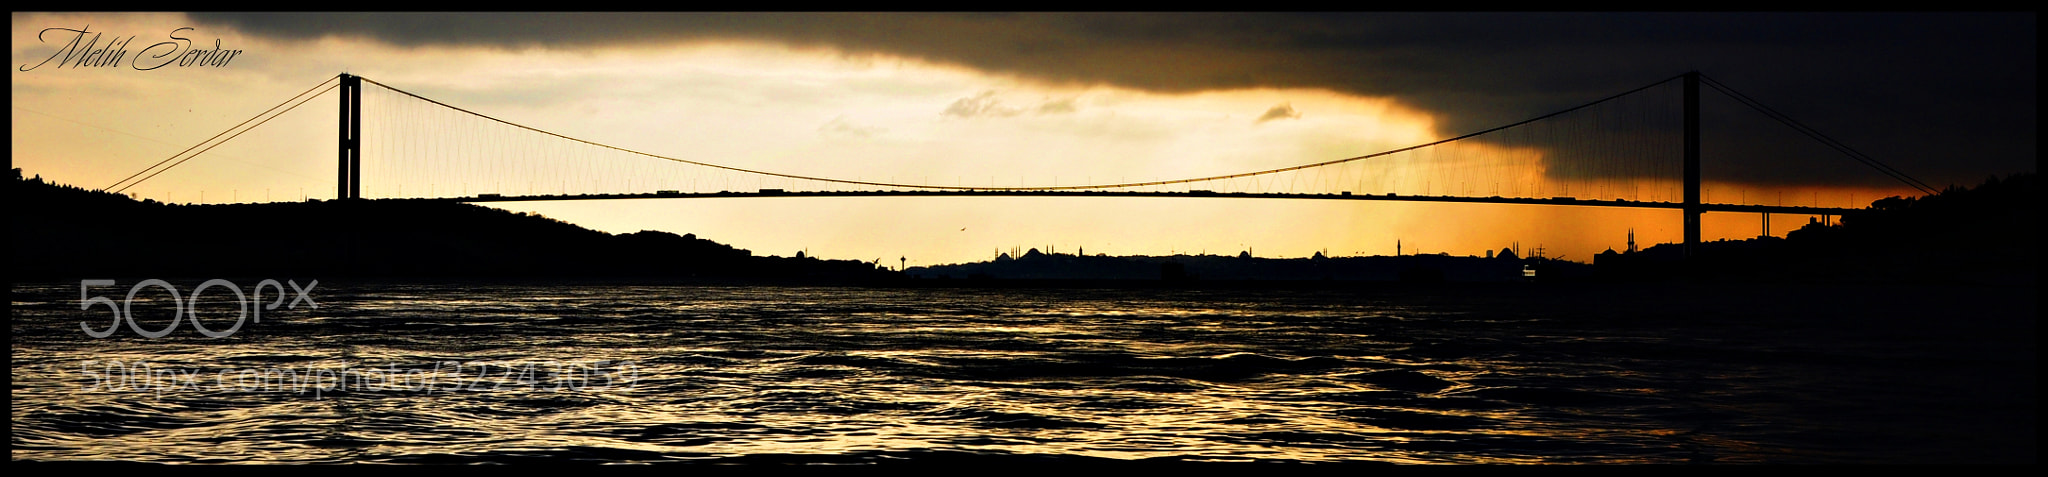 Photograph Bosphorus by Melih Gün on 500px